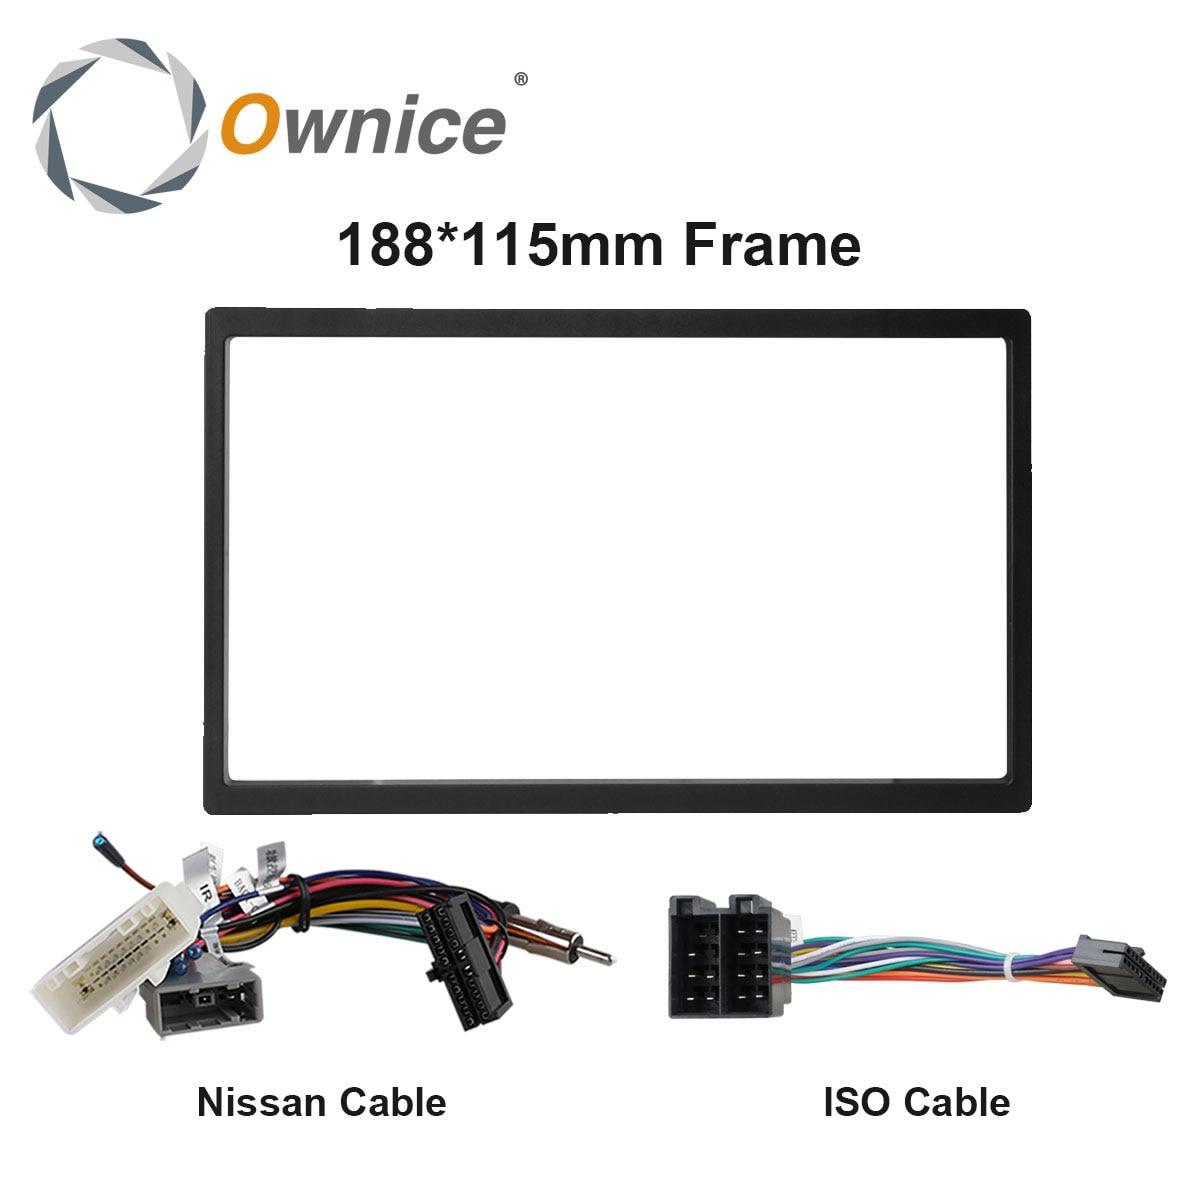 Ownice Auto DVD Audio 115X188mm Rahmen, Kabel für nissan, universal Kabel für 2 Din Universal Auto Radio.